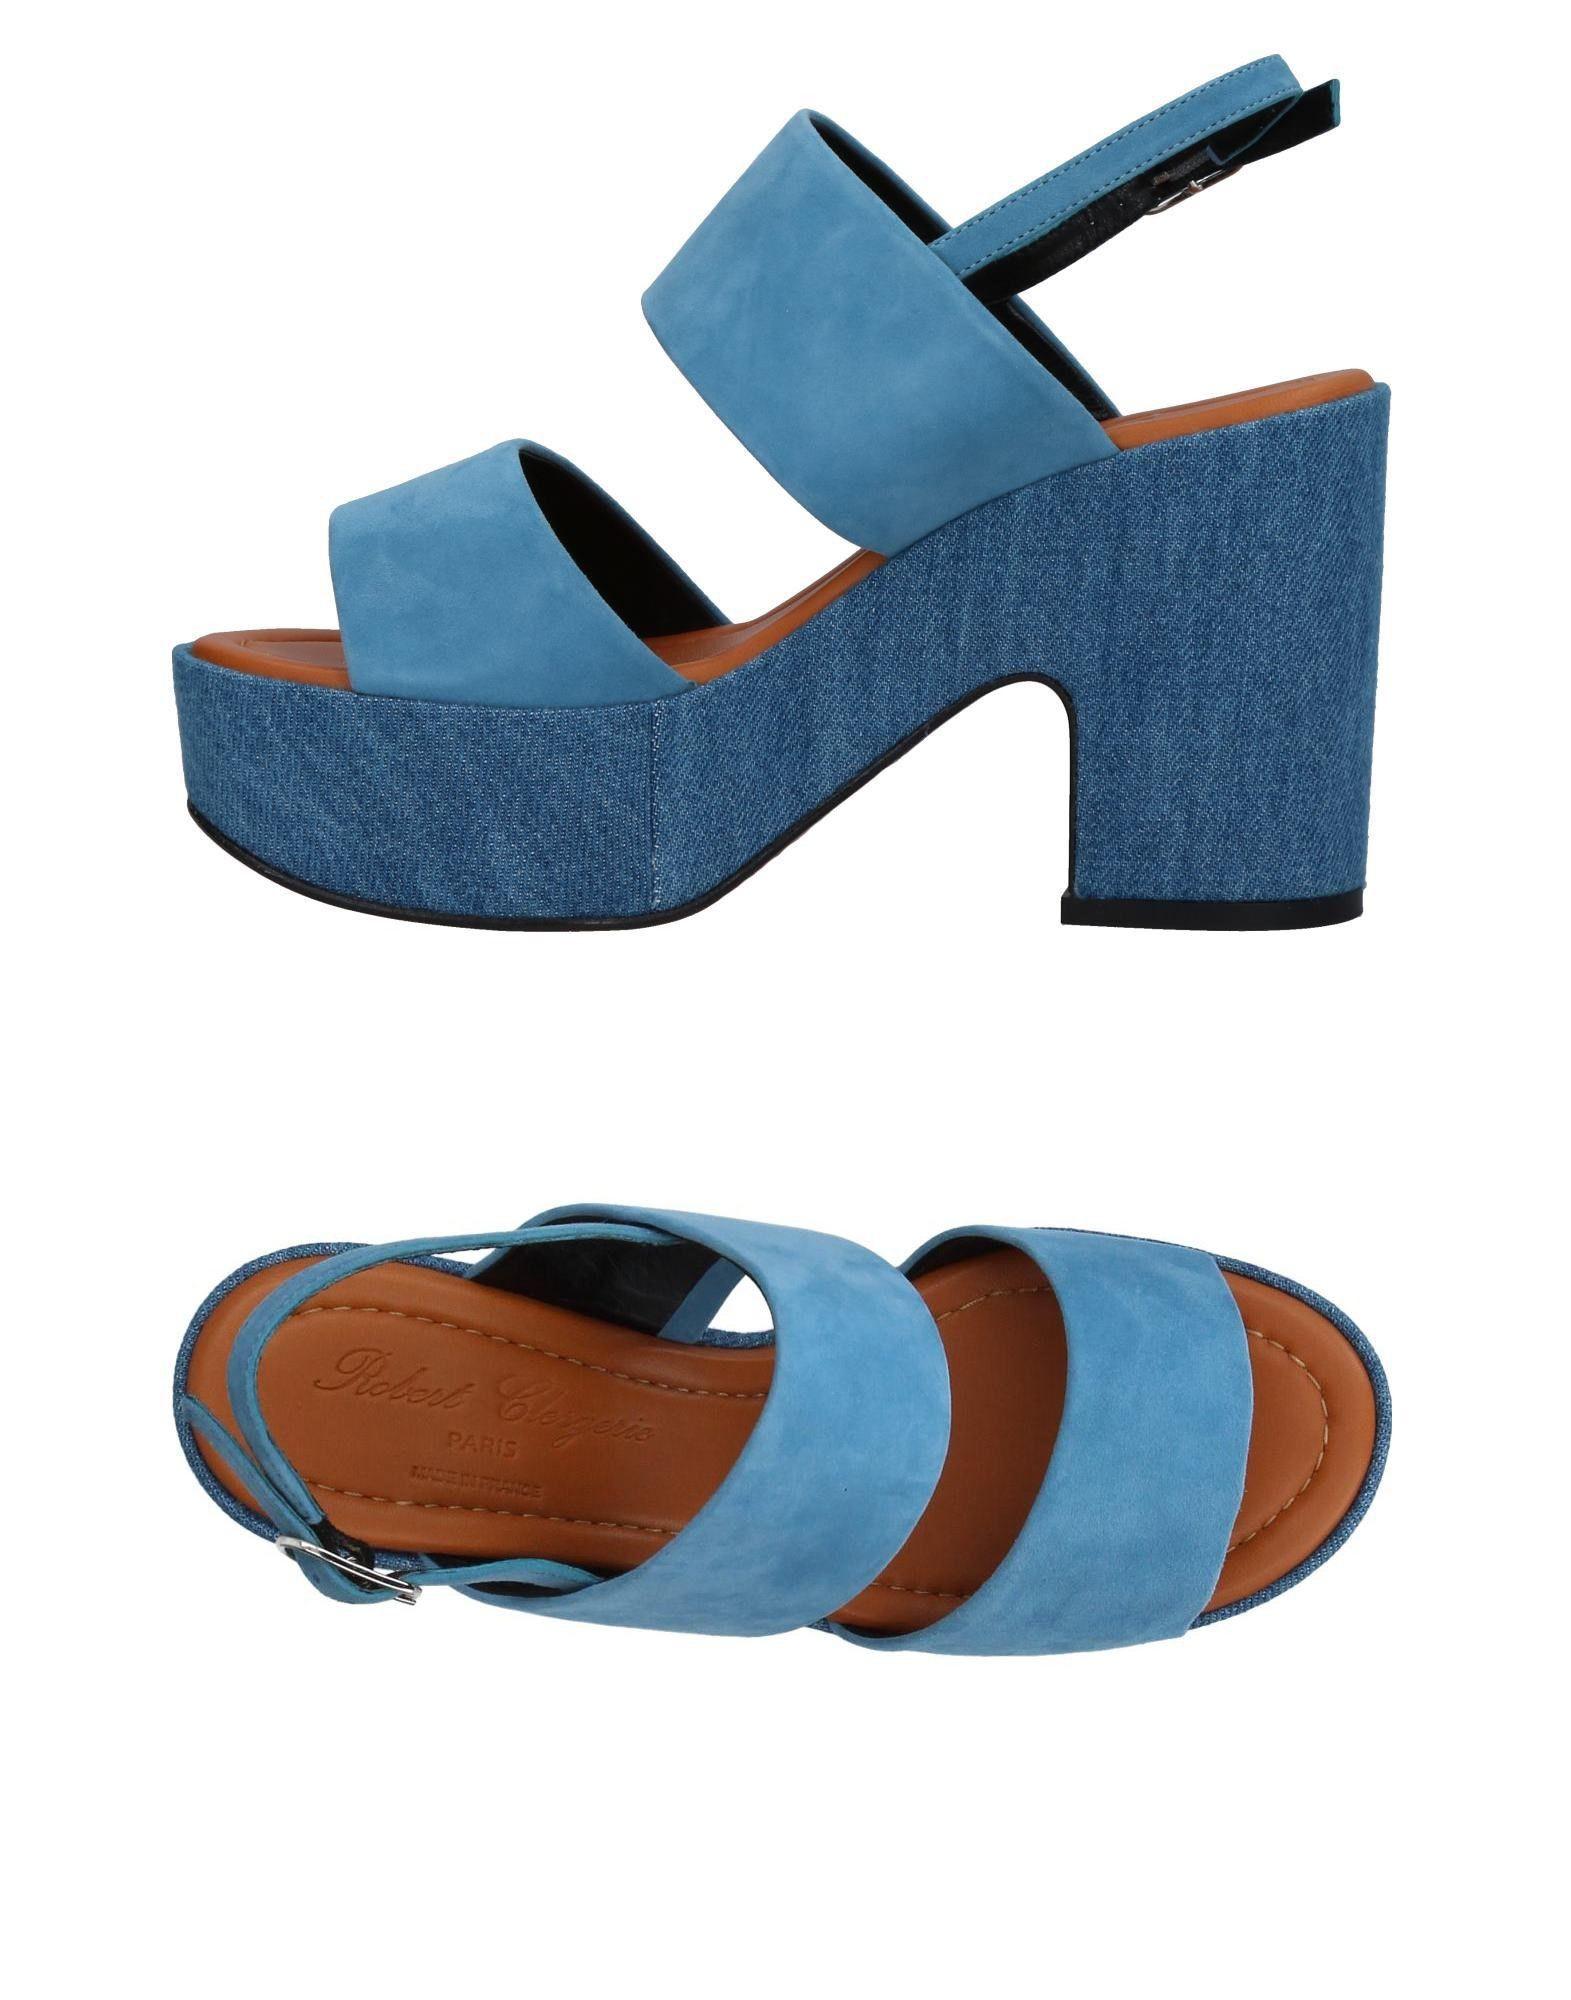 Stilvolle billige Schuhe Damen Robert Clergerie Sandalen Damen Schuhe  11400690RL c48264